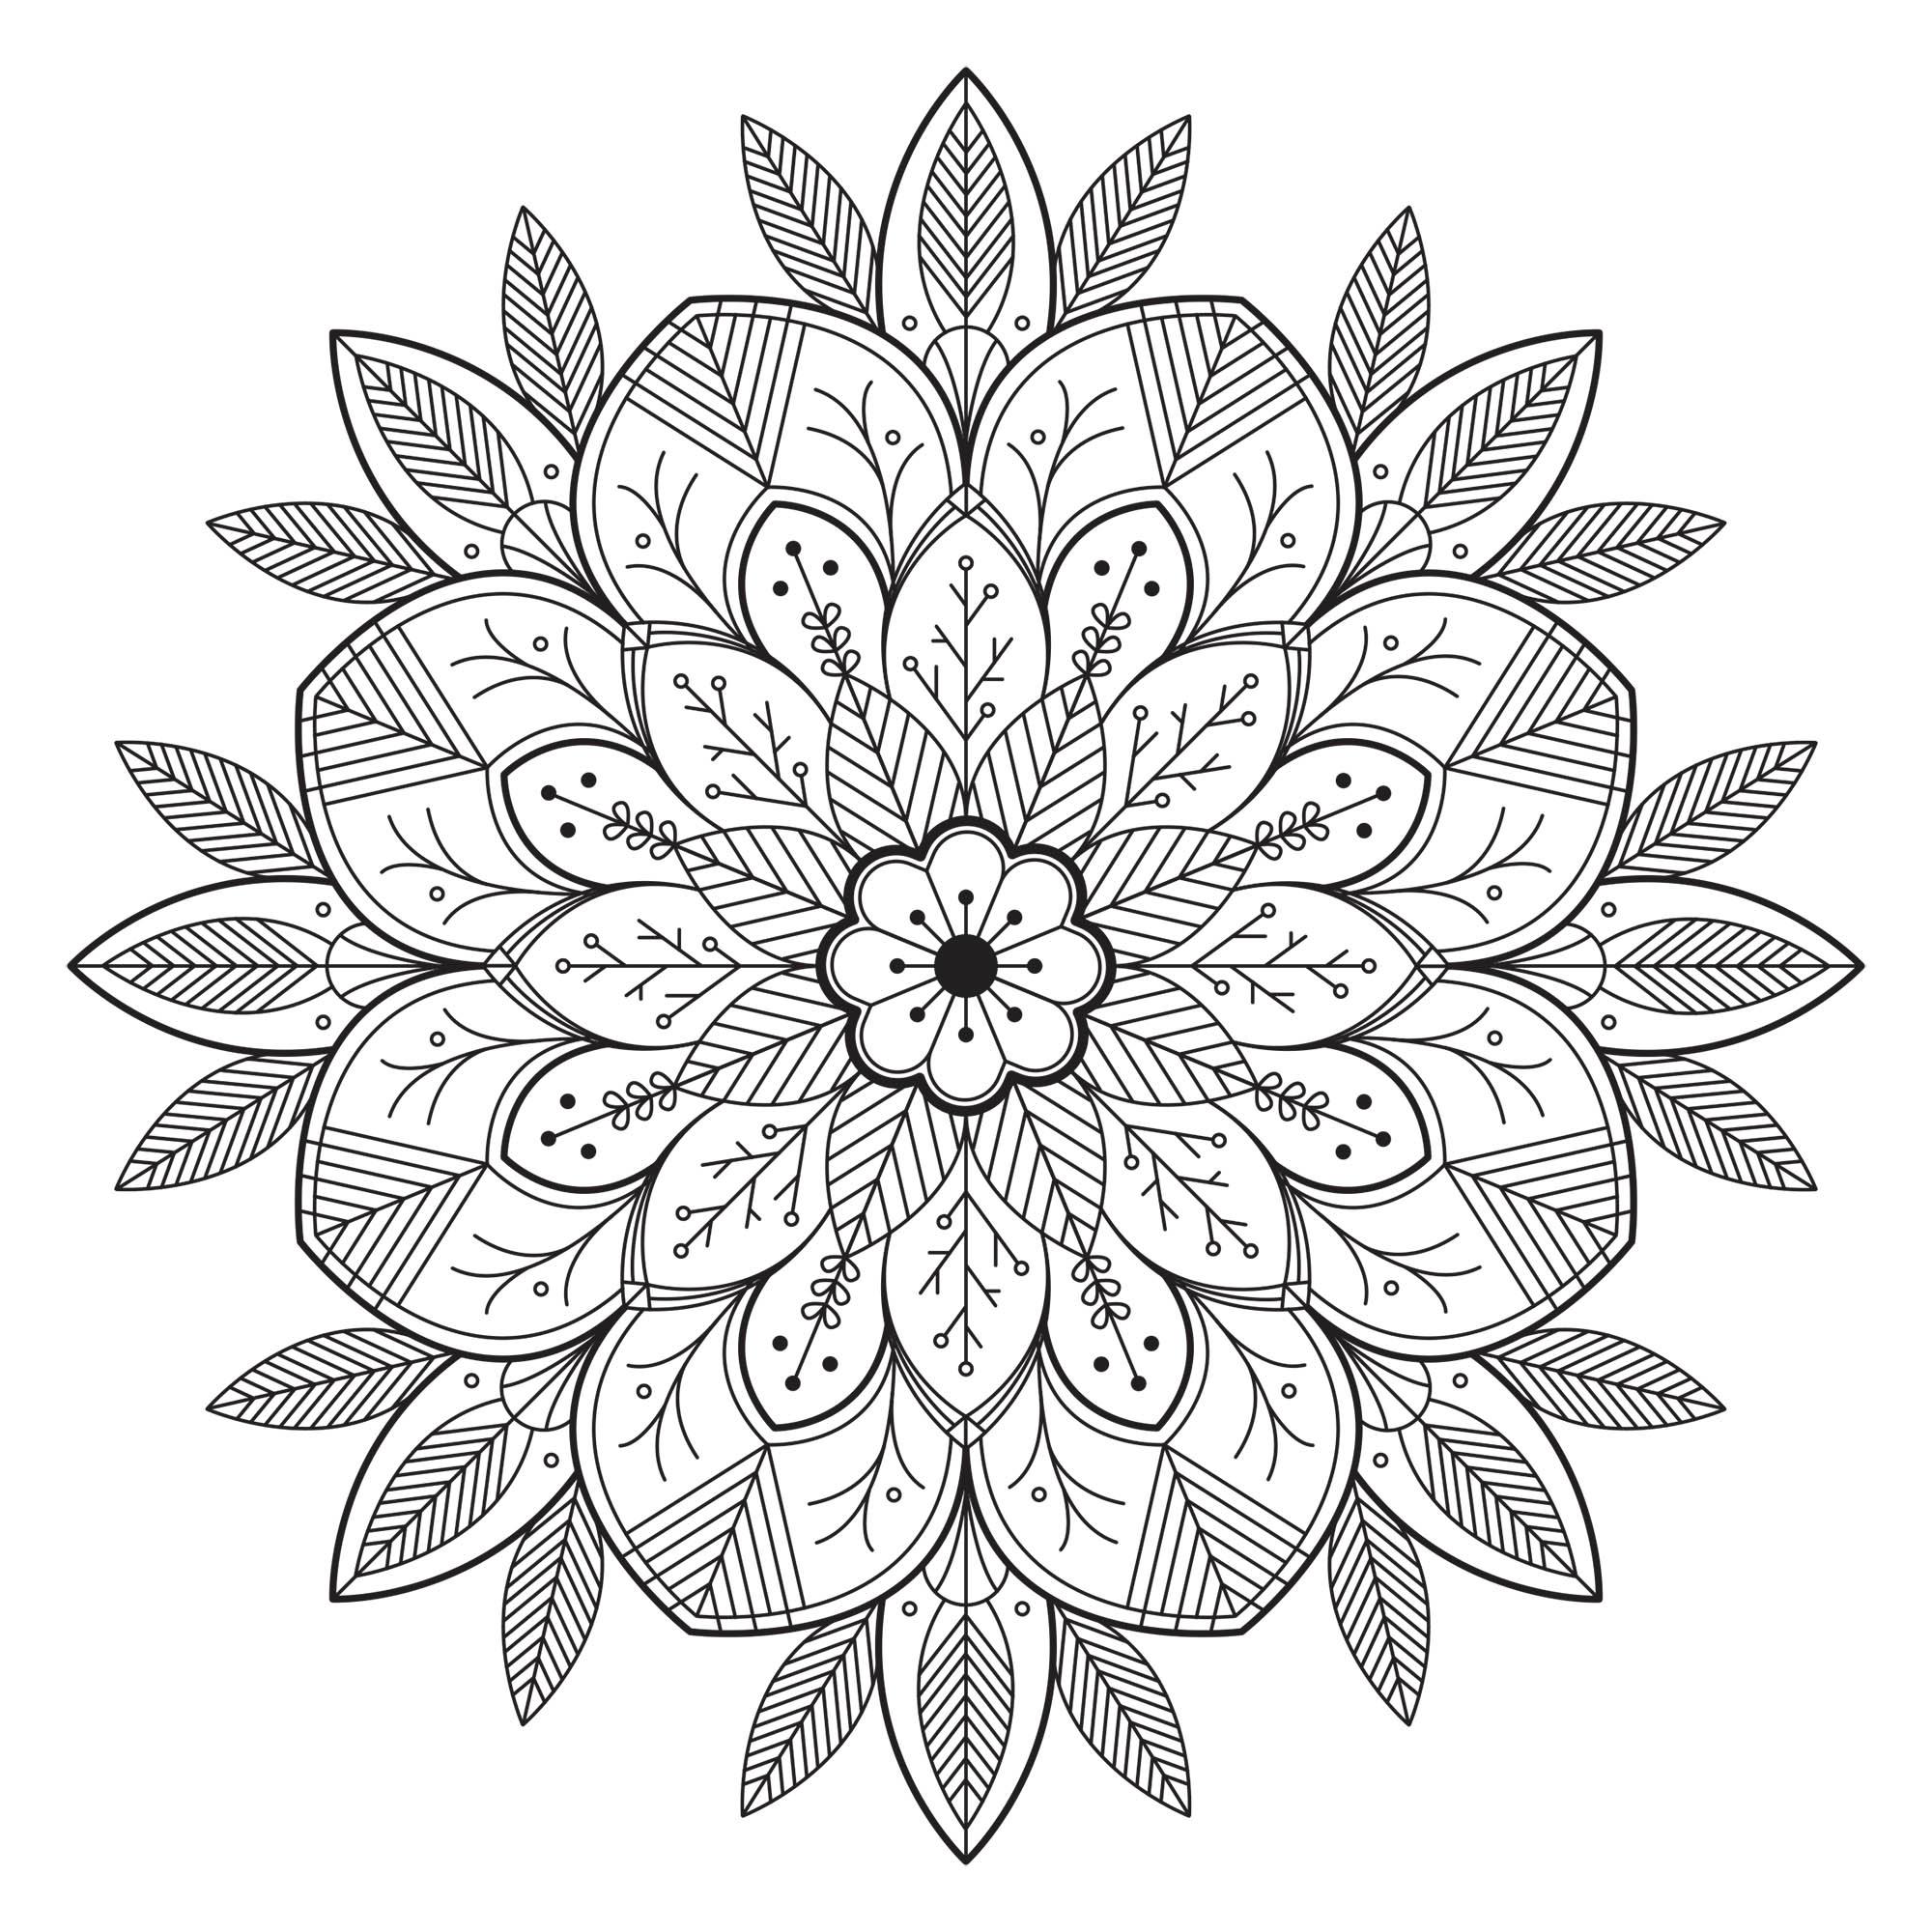 Leave & Flowers - M&alas Adult Coloring Pages